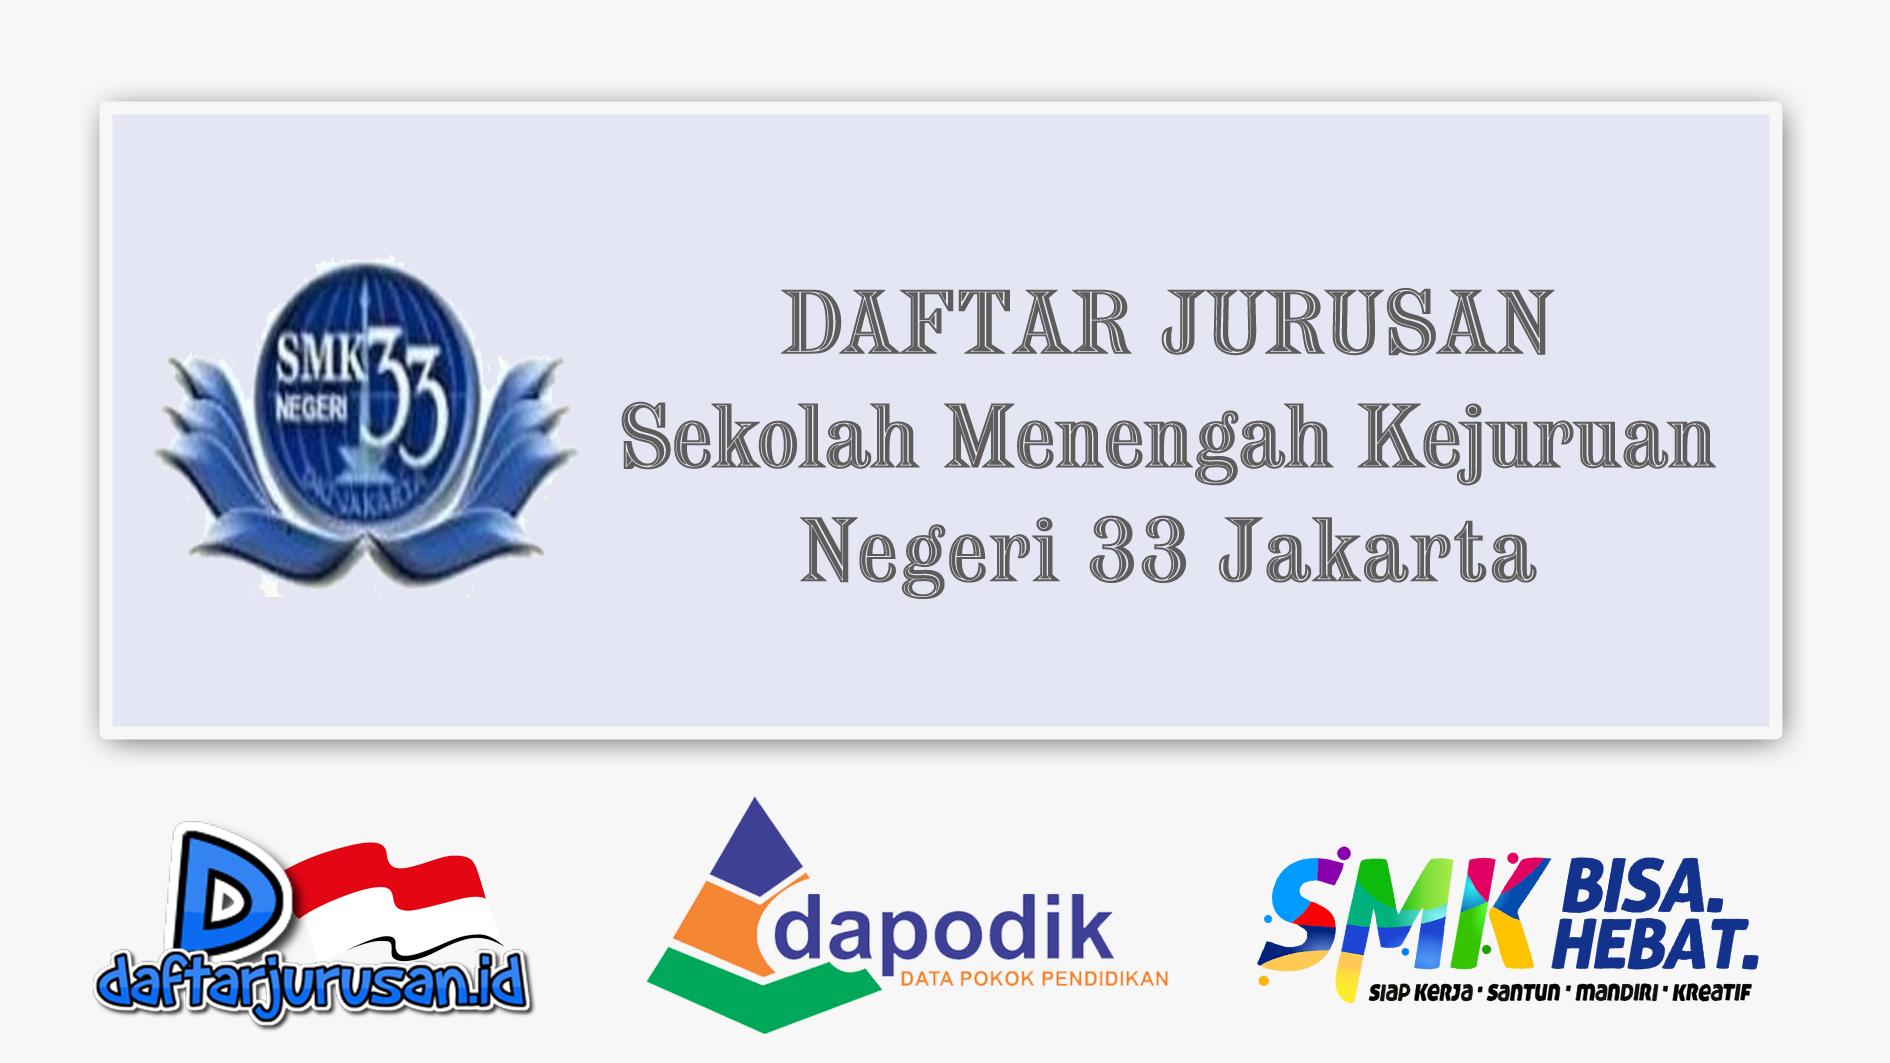 Daftar Jurusan SMK Negeri 33 Jakarta Utara